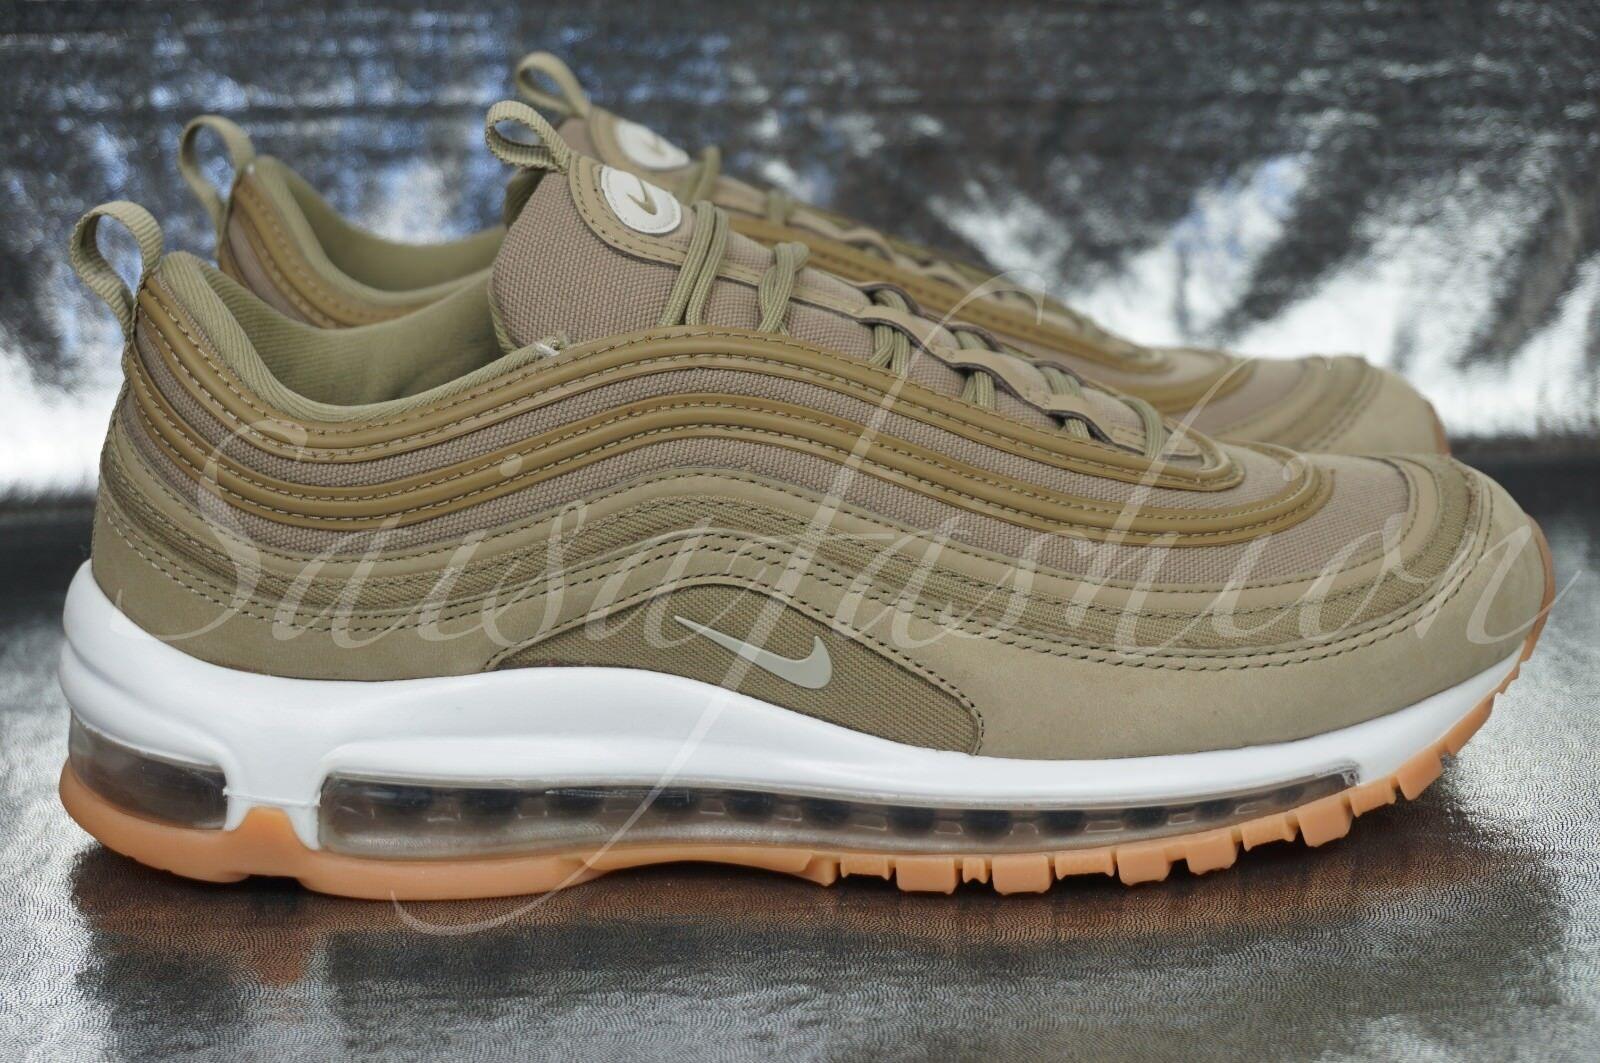 Nike Air Max '97 UT Women's Running Shoes Sz 9